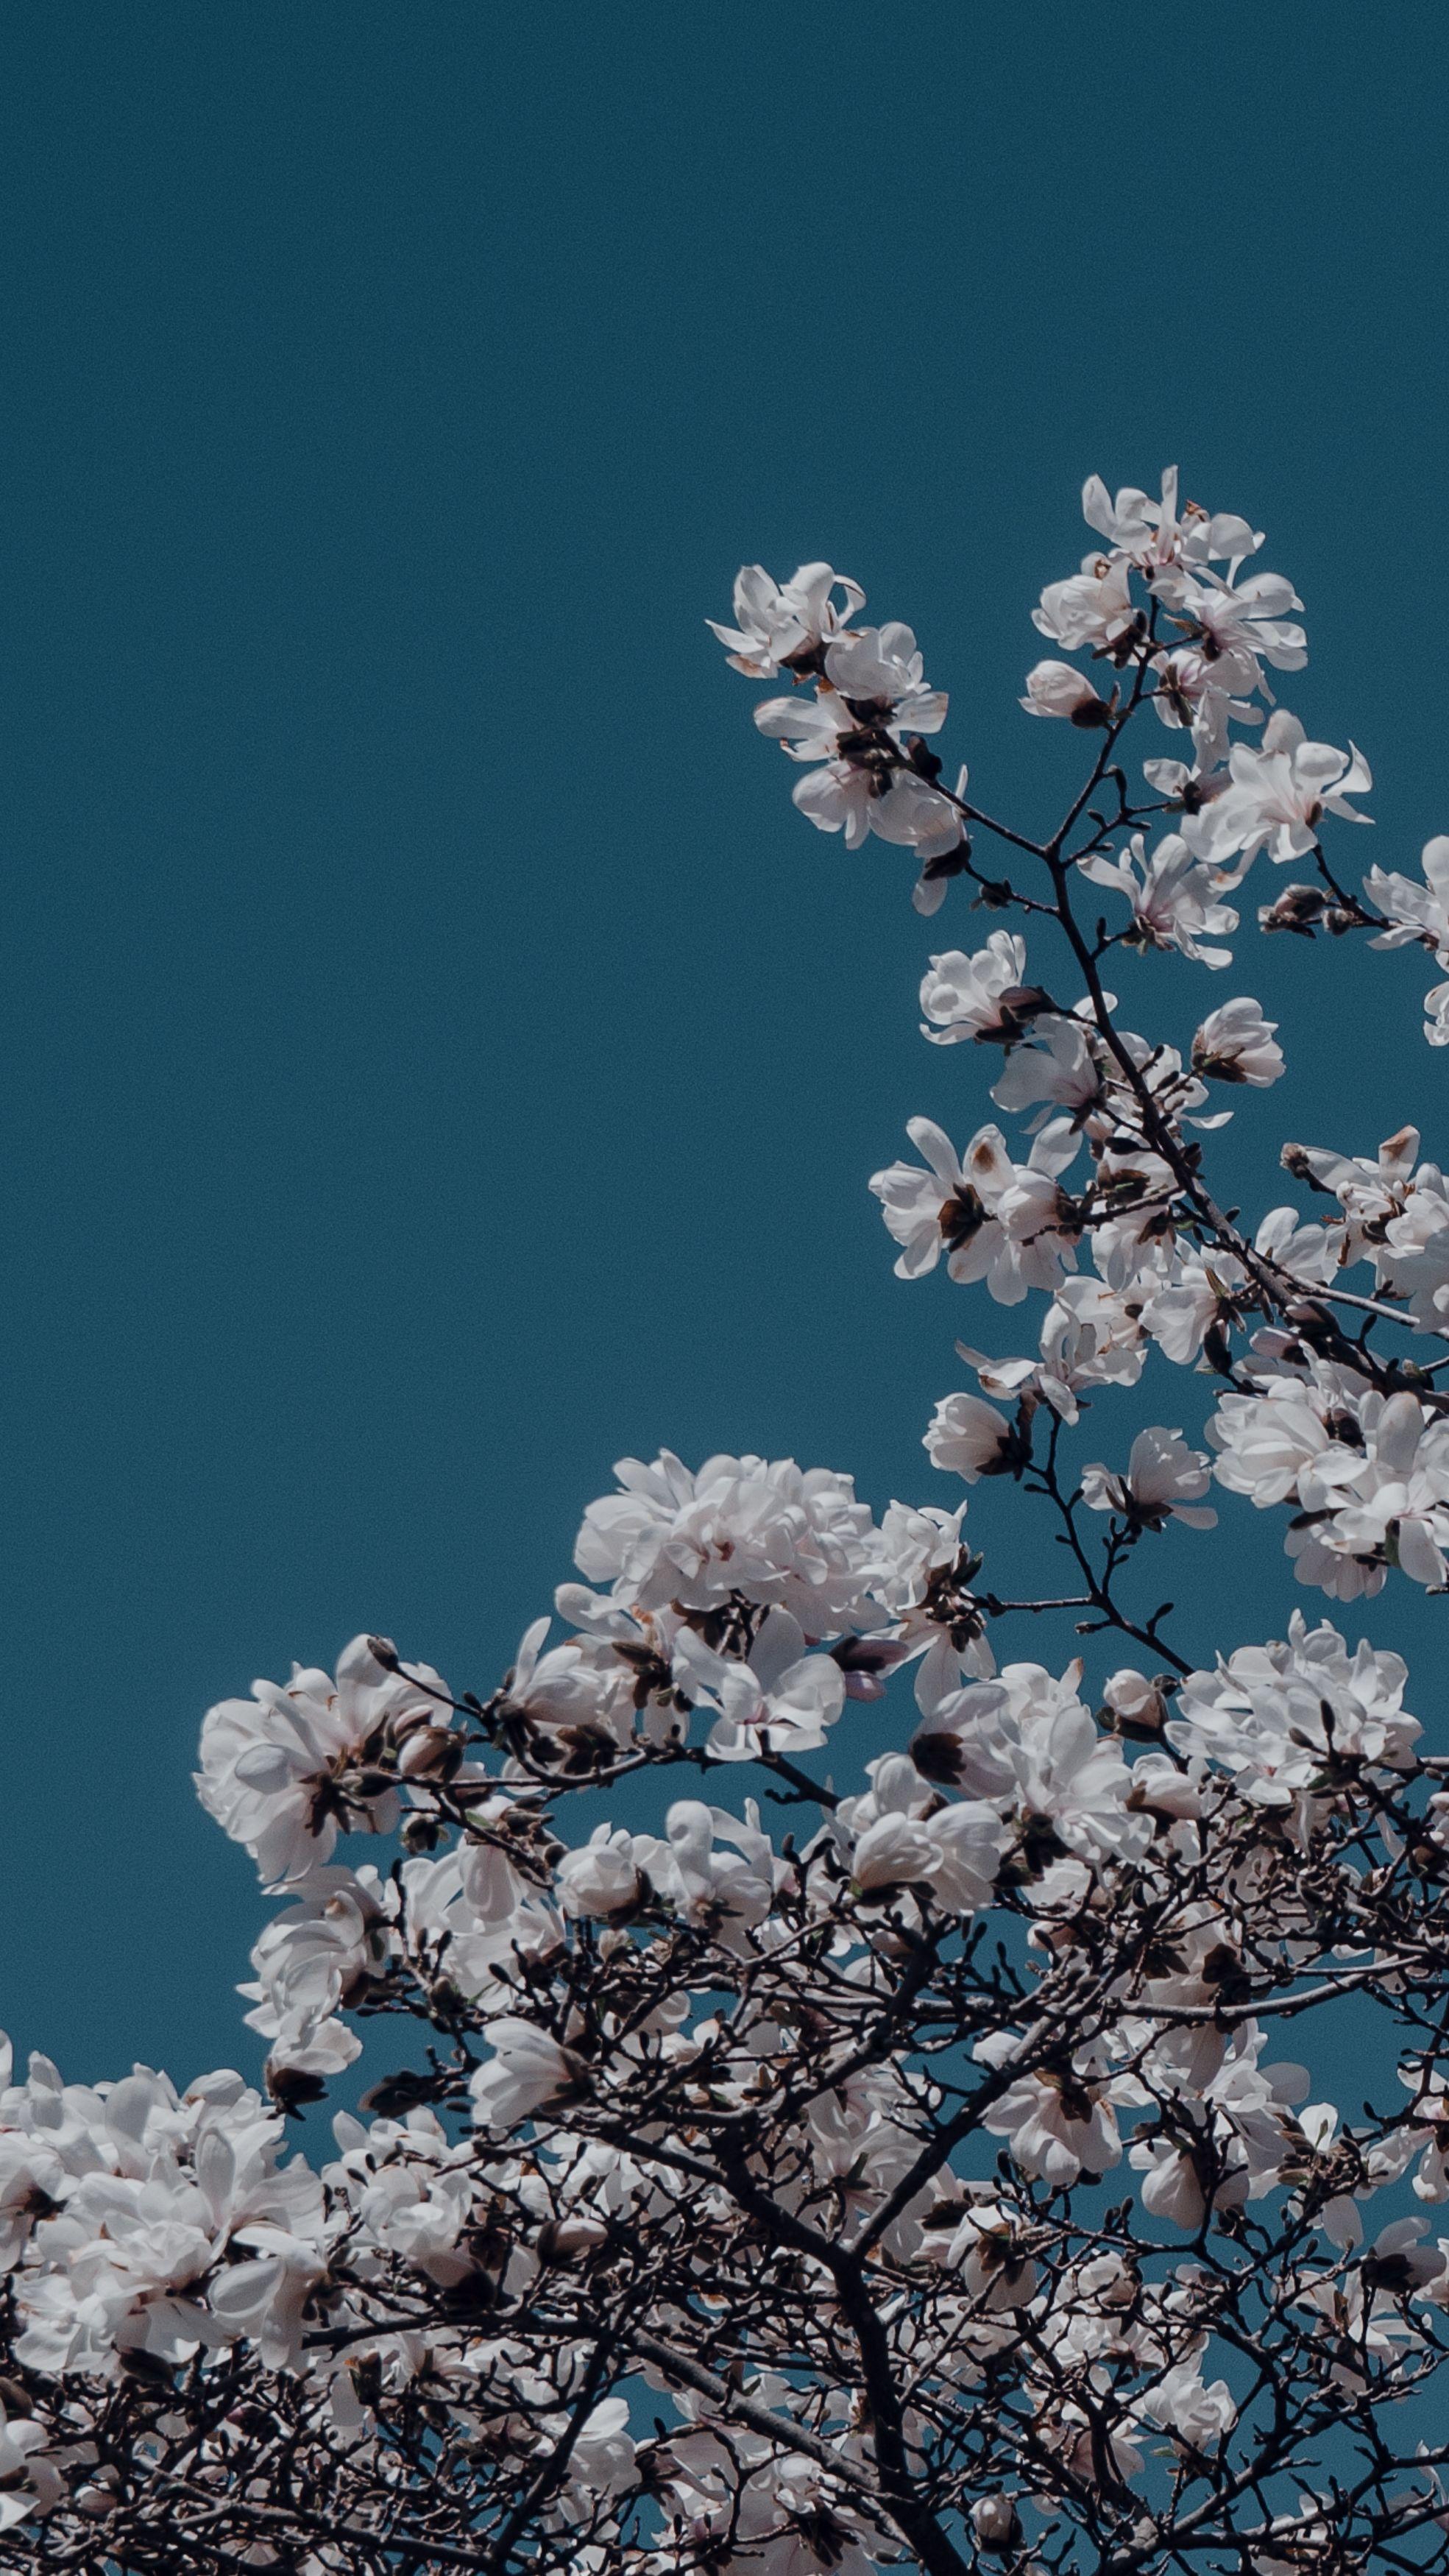 Beautiful Flowers Aesthetic Wallpaper Backgrounds For Iphone Vintage Flowers Wallpaper Flower Iphone Wallpaper Flower Aesthetic